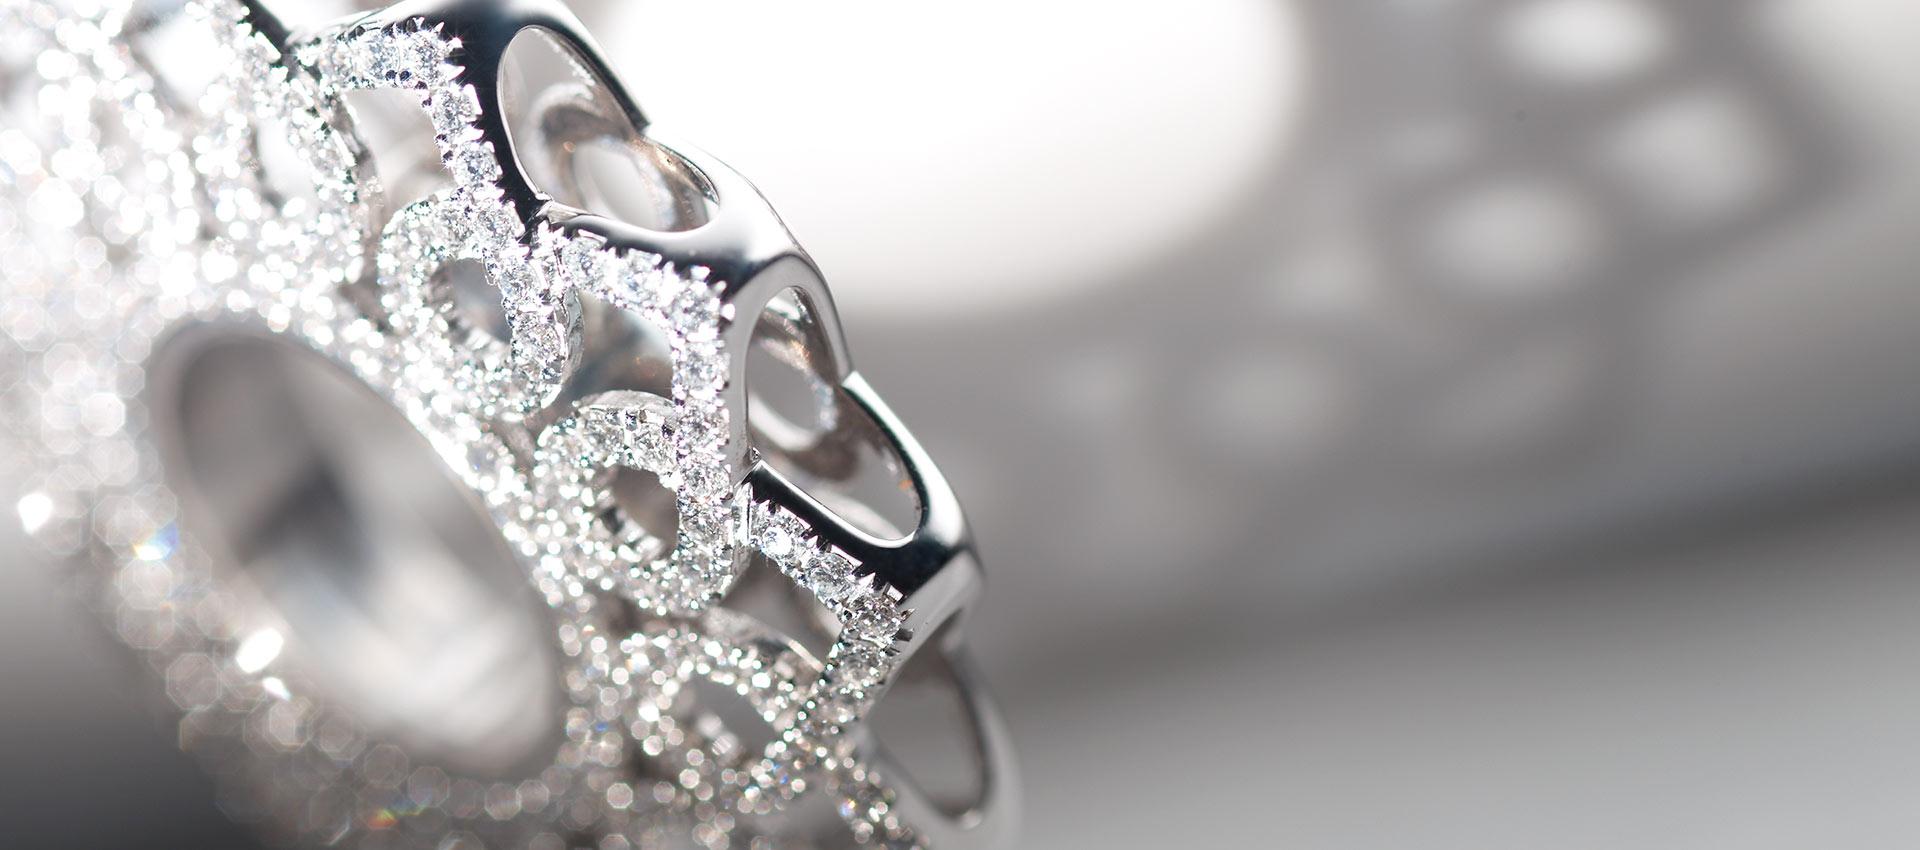 Backes & Stauss ideal cut diamonds